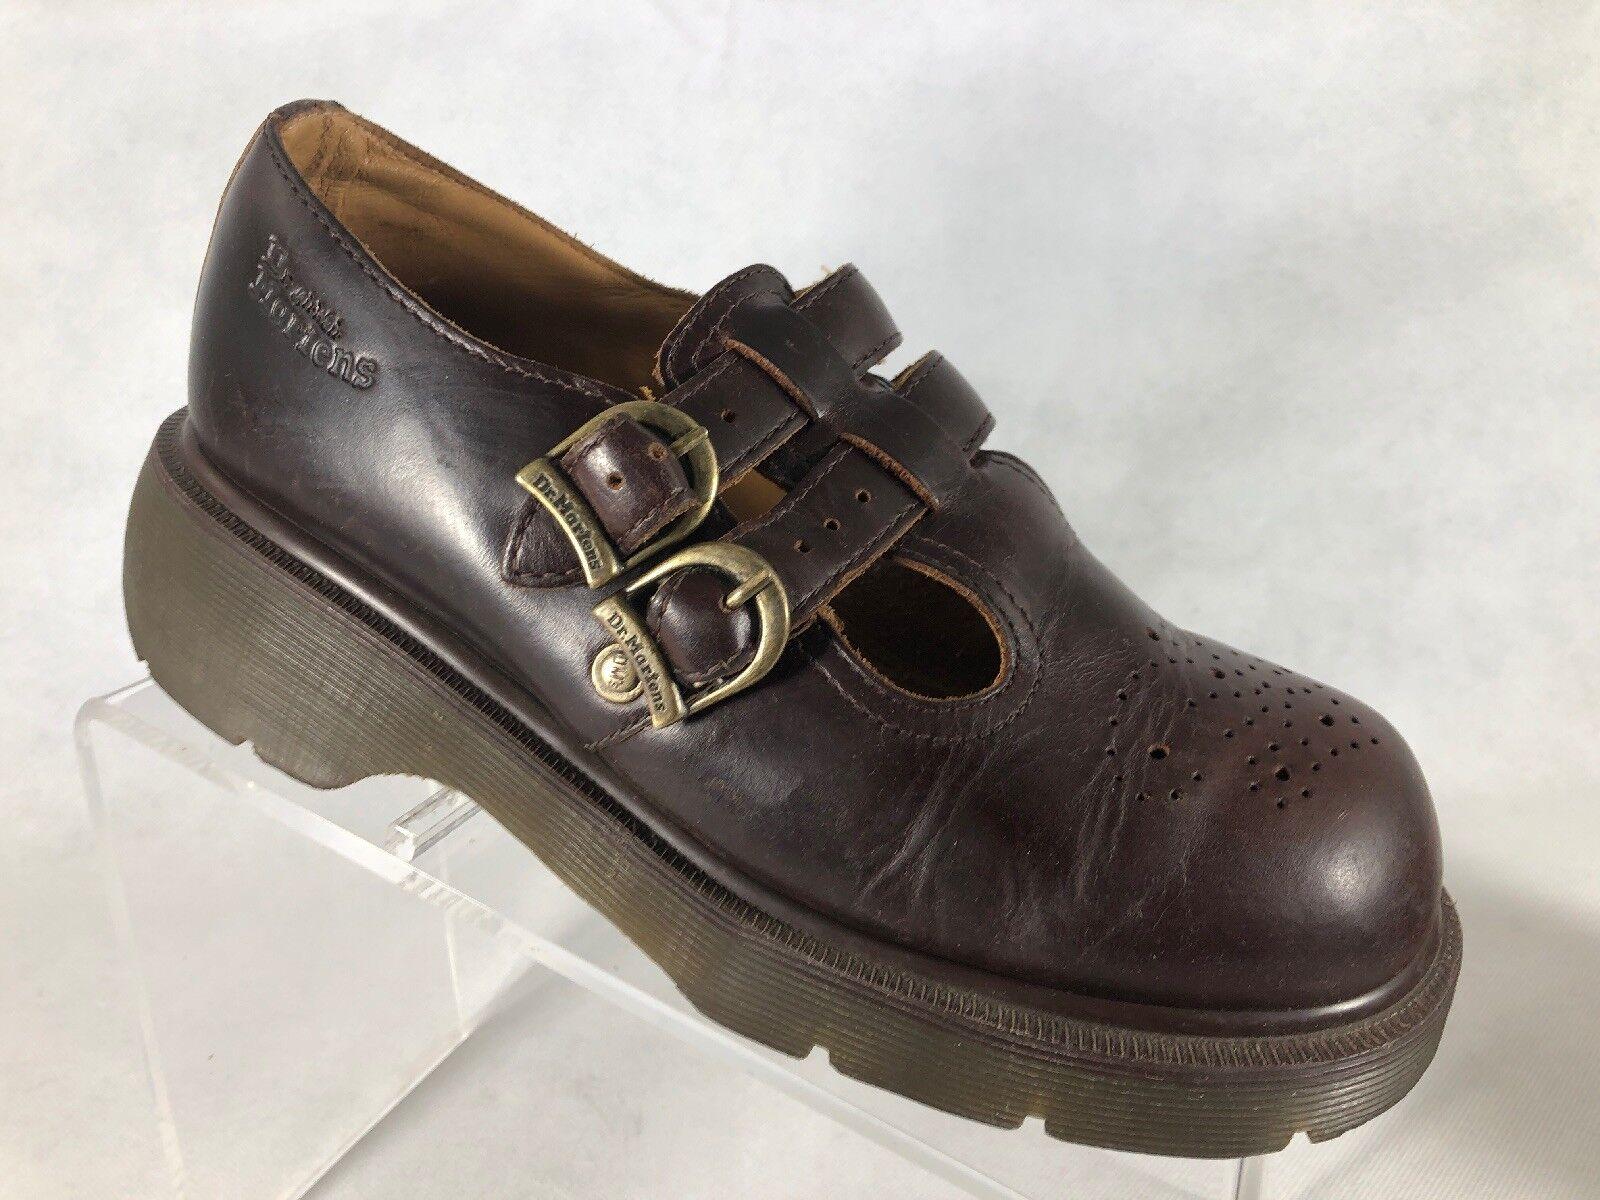 Dr. Martens damen braun Leather Leather Leather Mary Jane schuhe AW004 Größe 7. M2 baf0bc